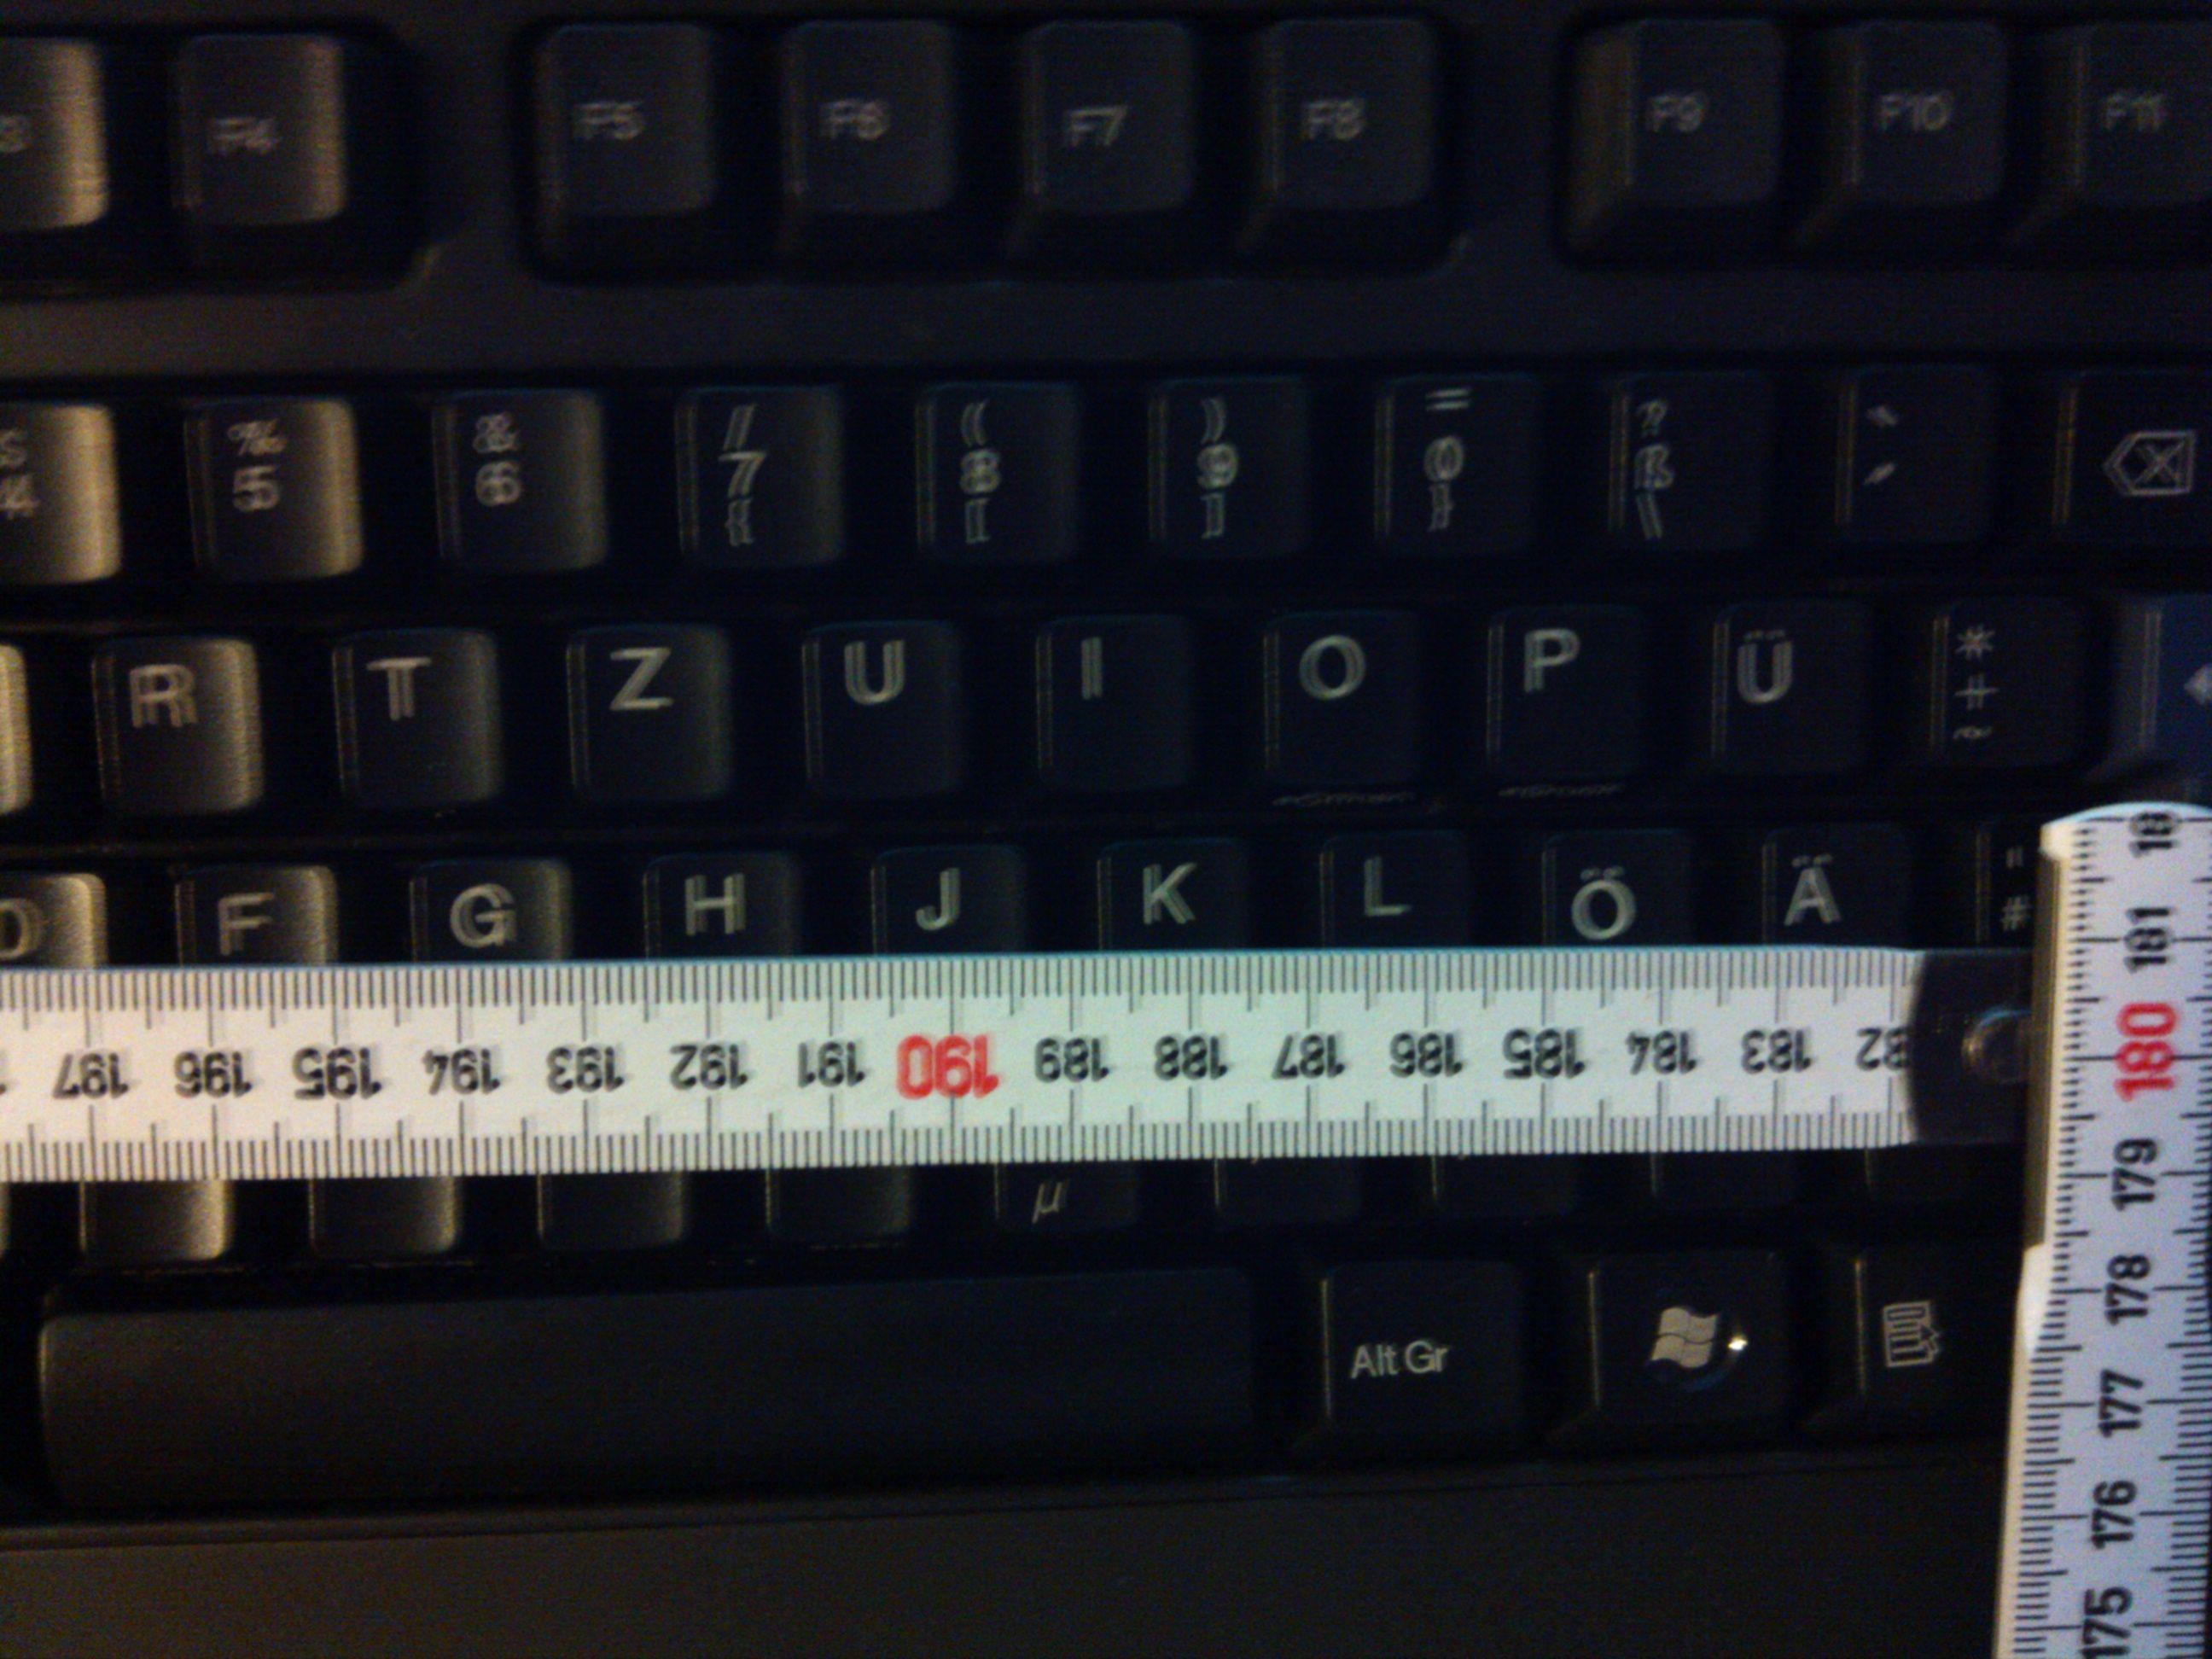 Lenovo keyboard sk 8815